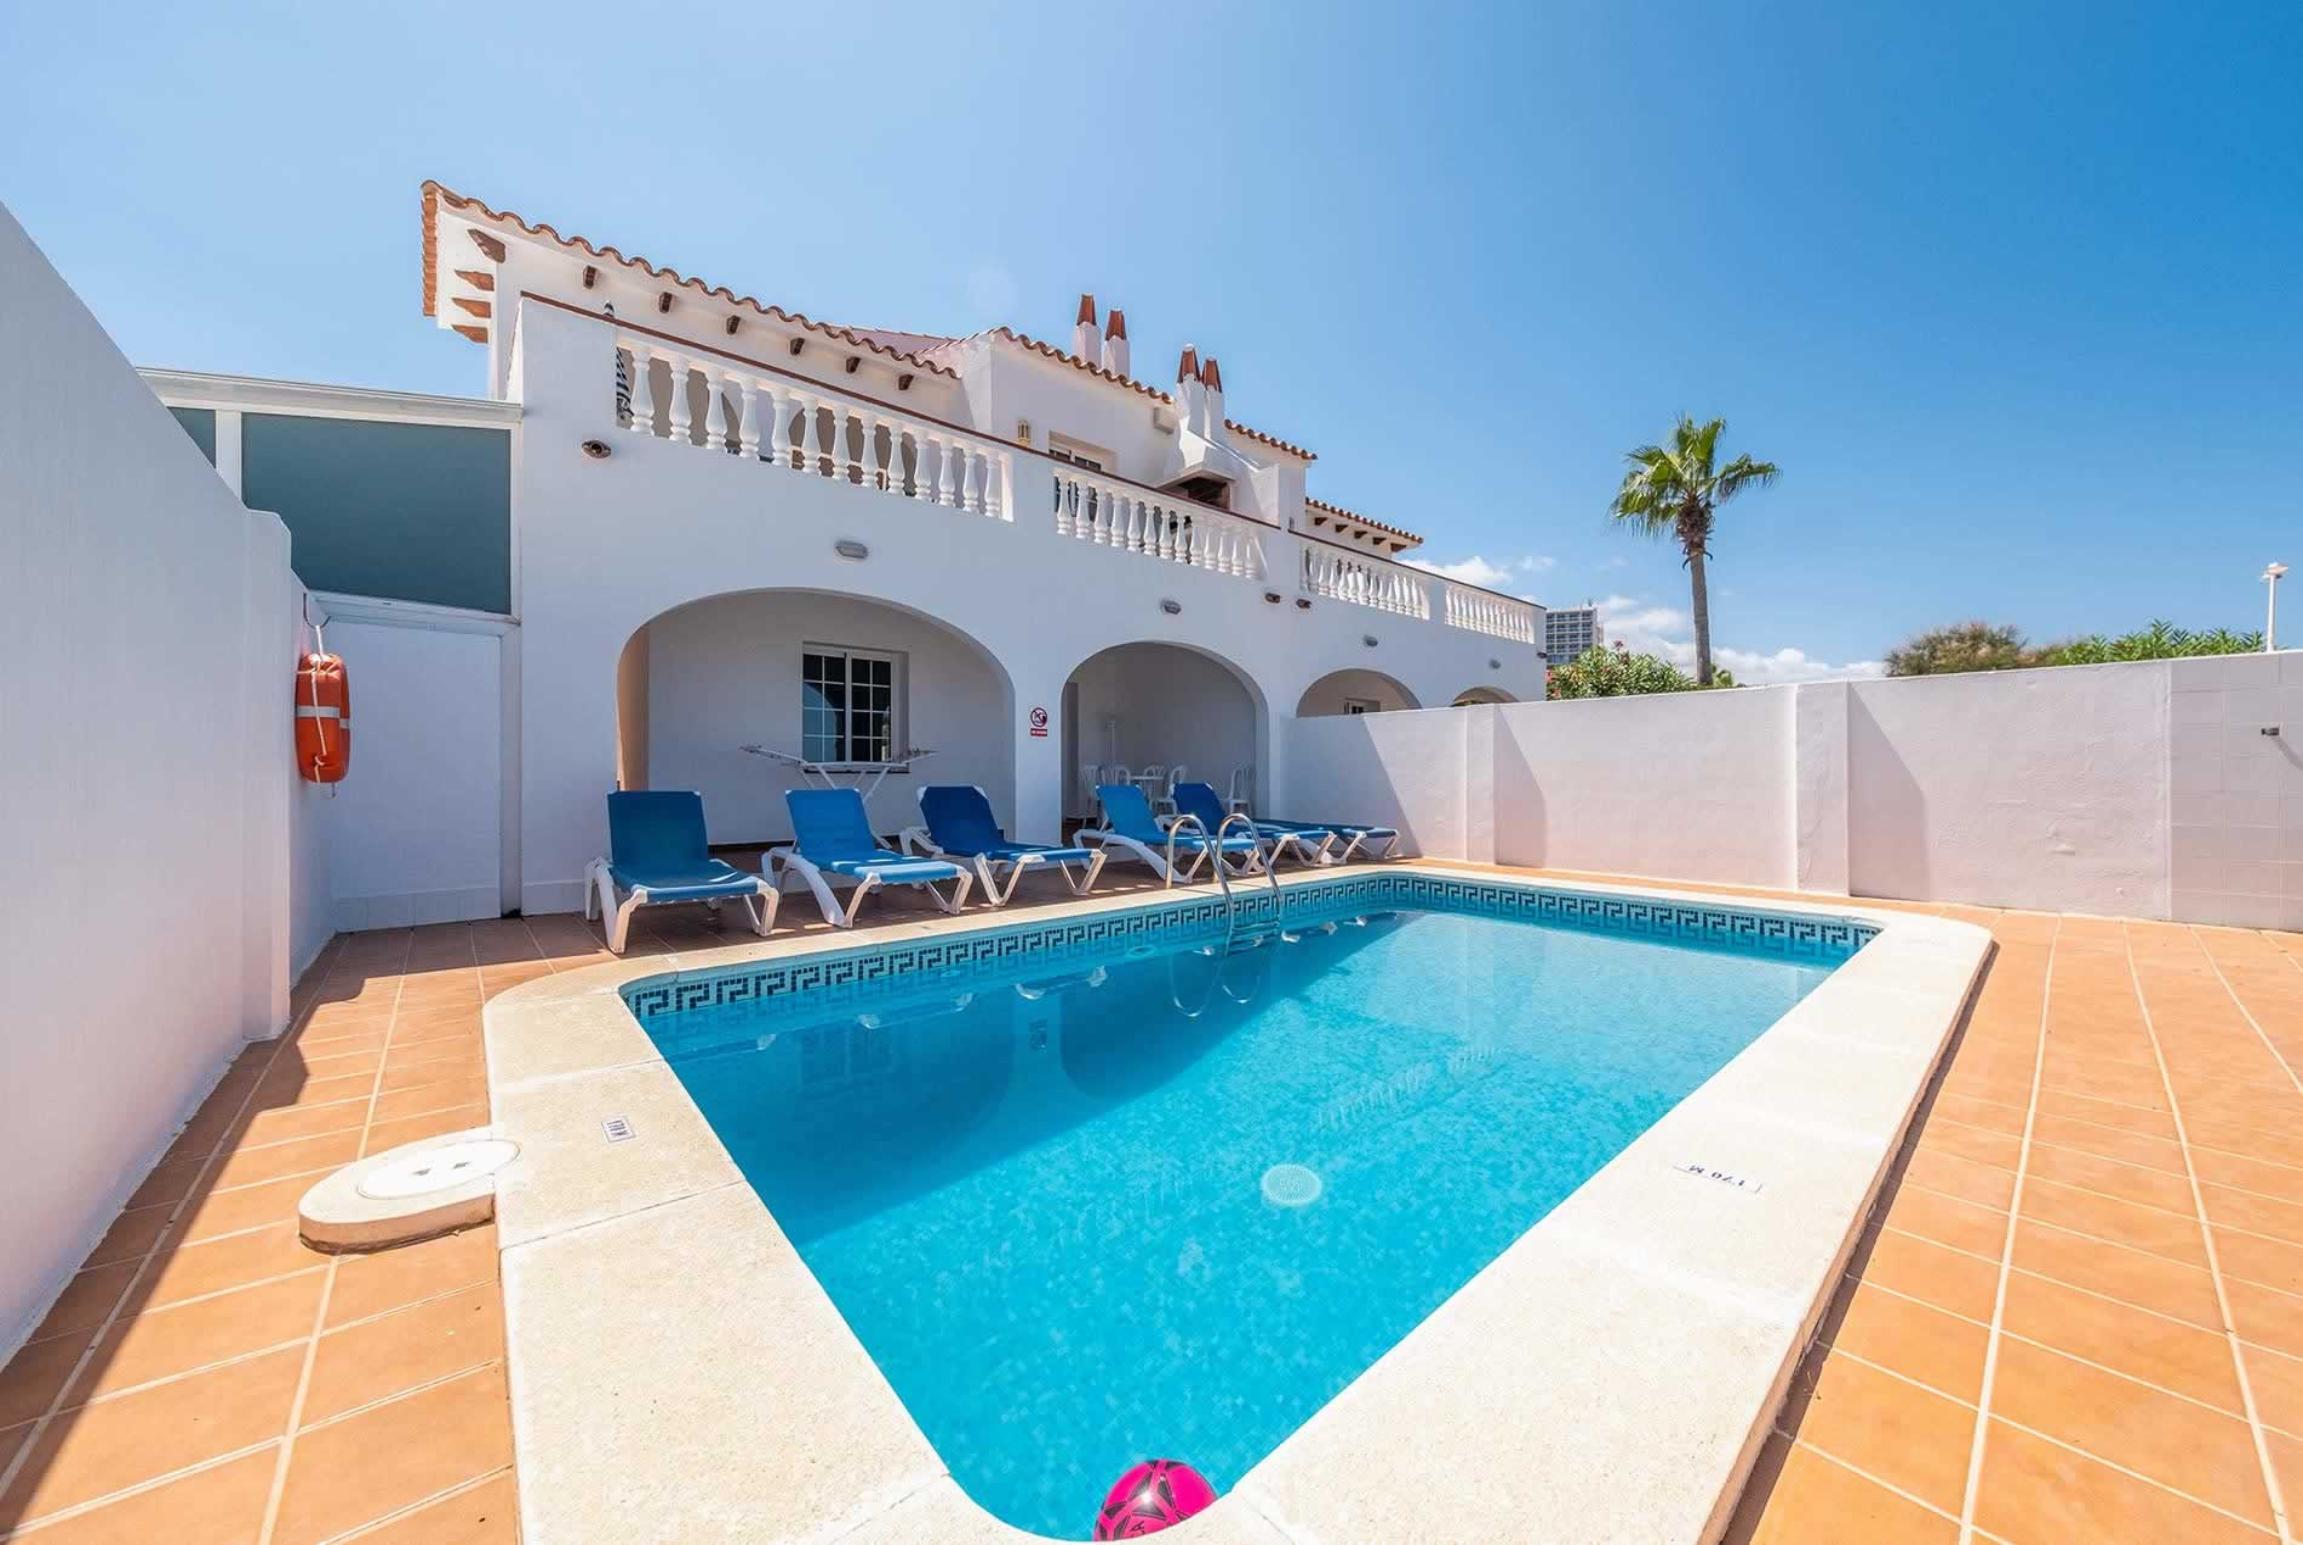 Ferienhaus Bellavista II (2654270), Arenal De'N Castell, Menorca, Balearische Inseln, Spanien, Bild 1